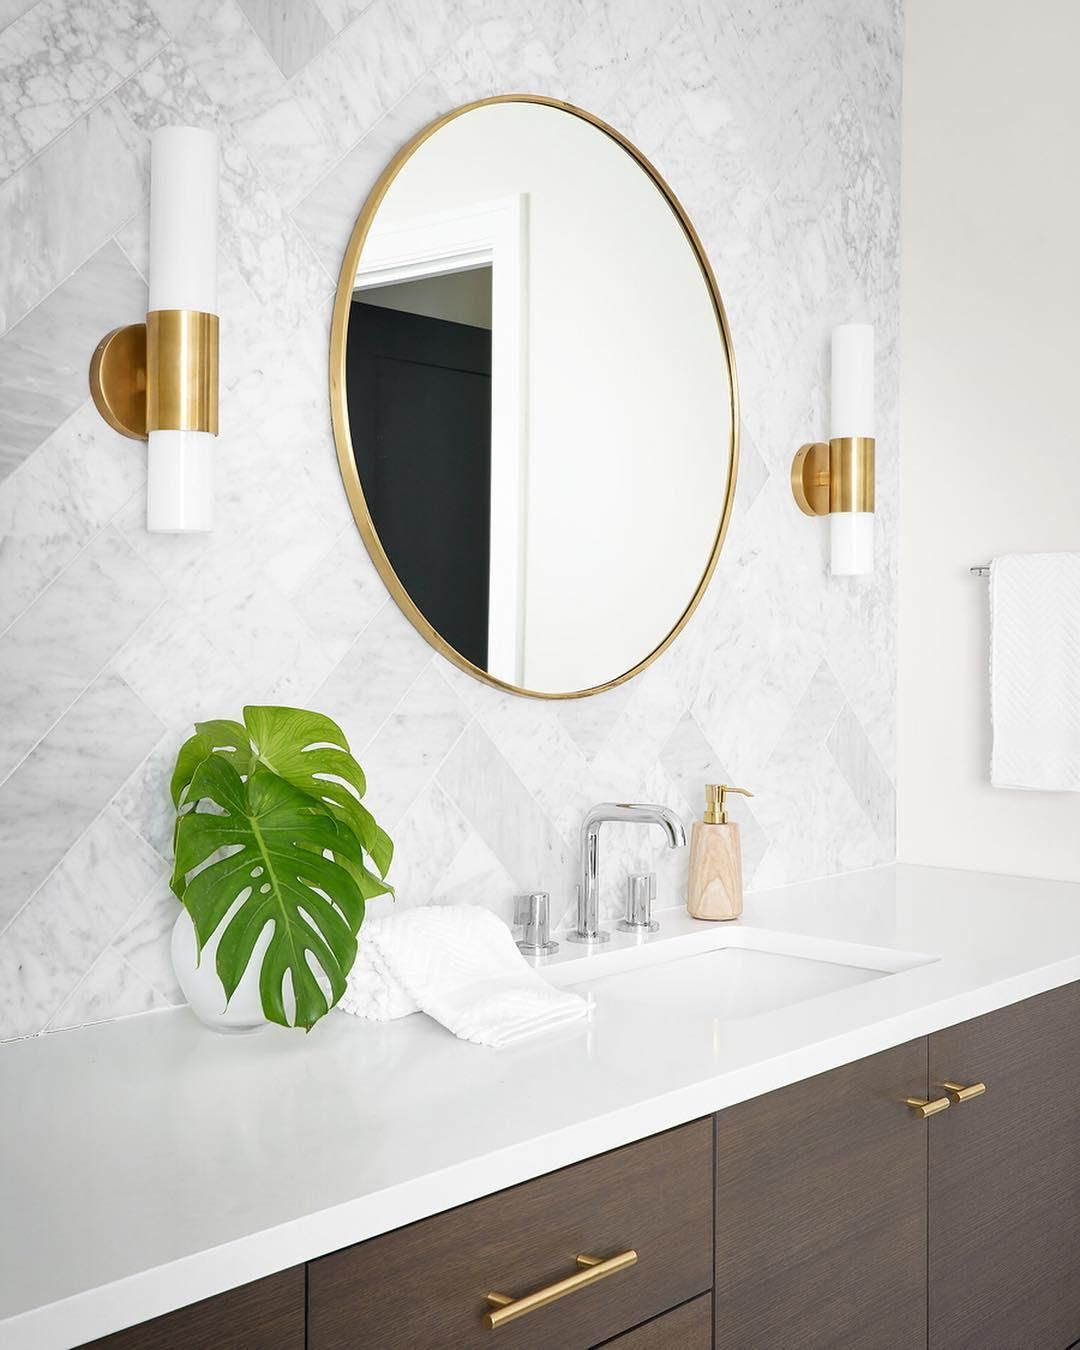 Penz Medium Cylindrical Sconce Minimalist Bathroom Inspiration Round Mirror Bathroom Bathroom Inspiration [ 1350 x 1080 Pixel ]